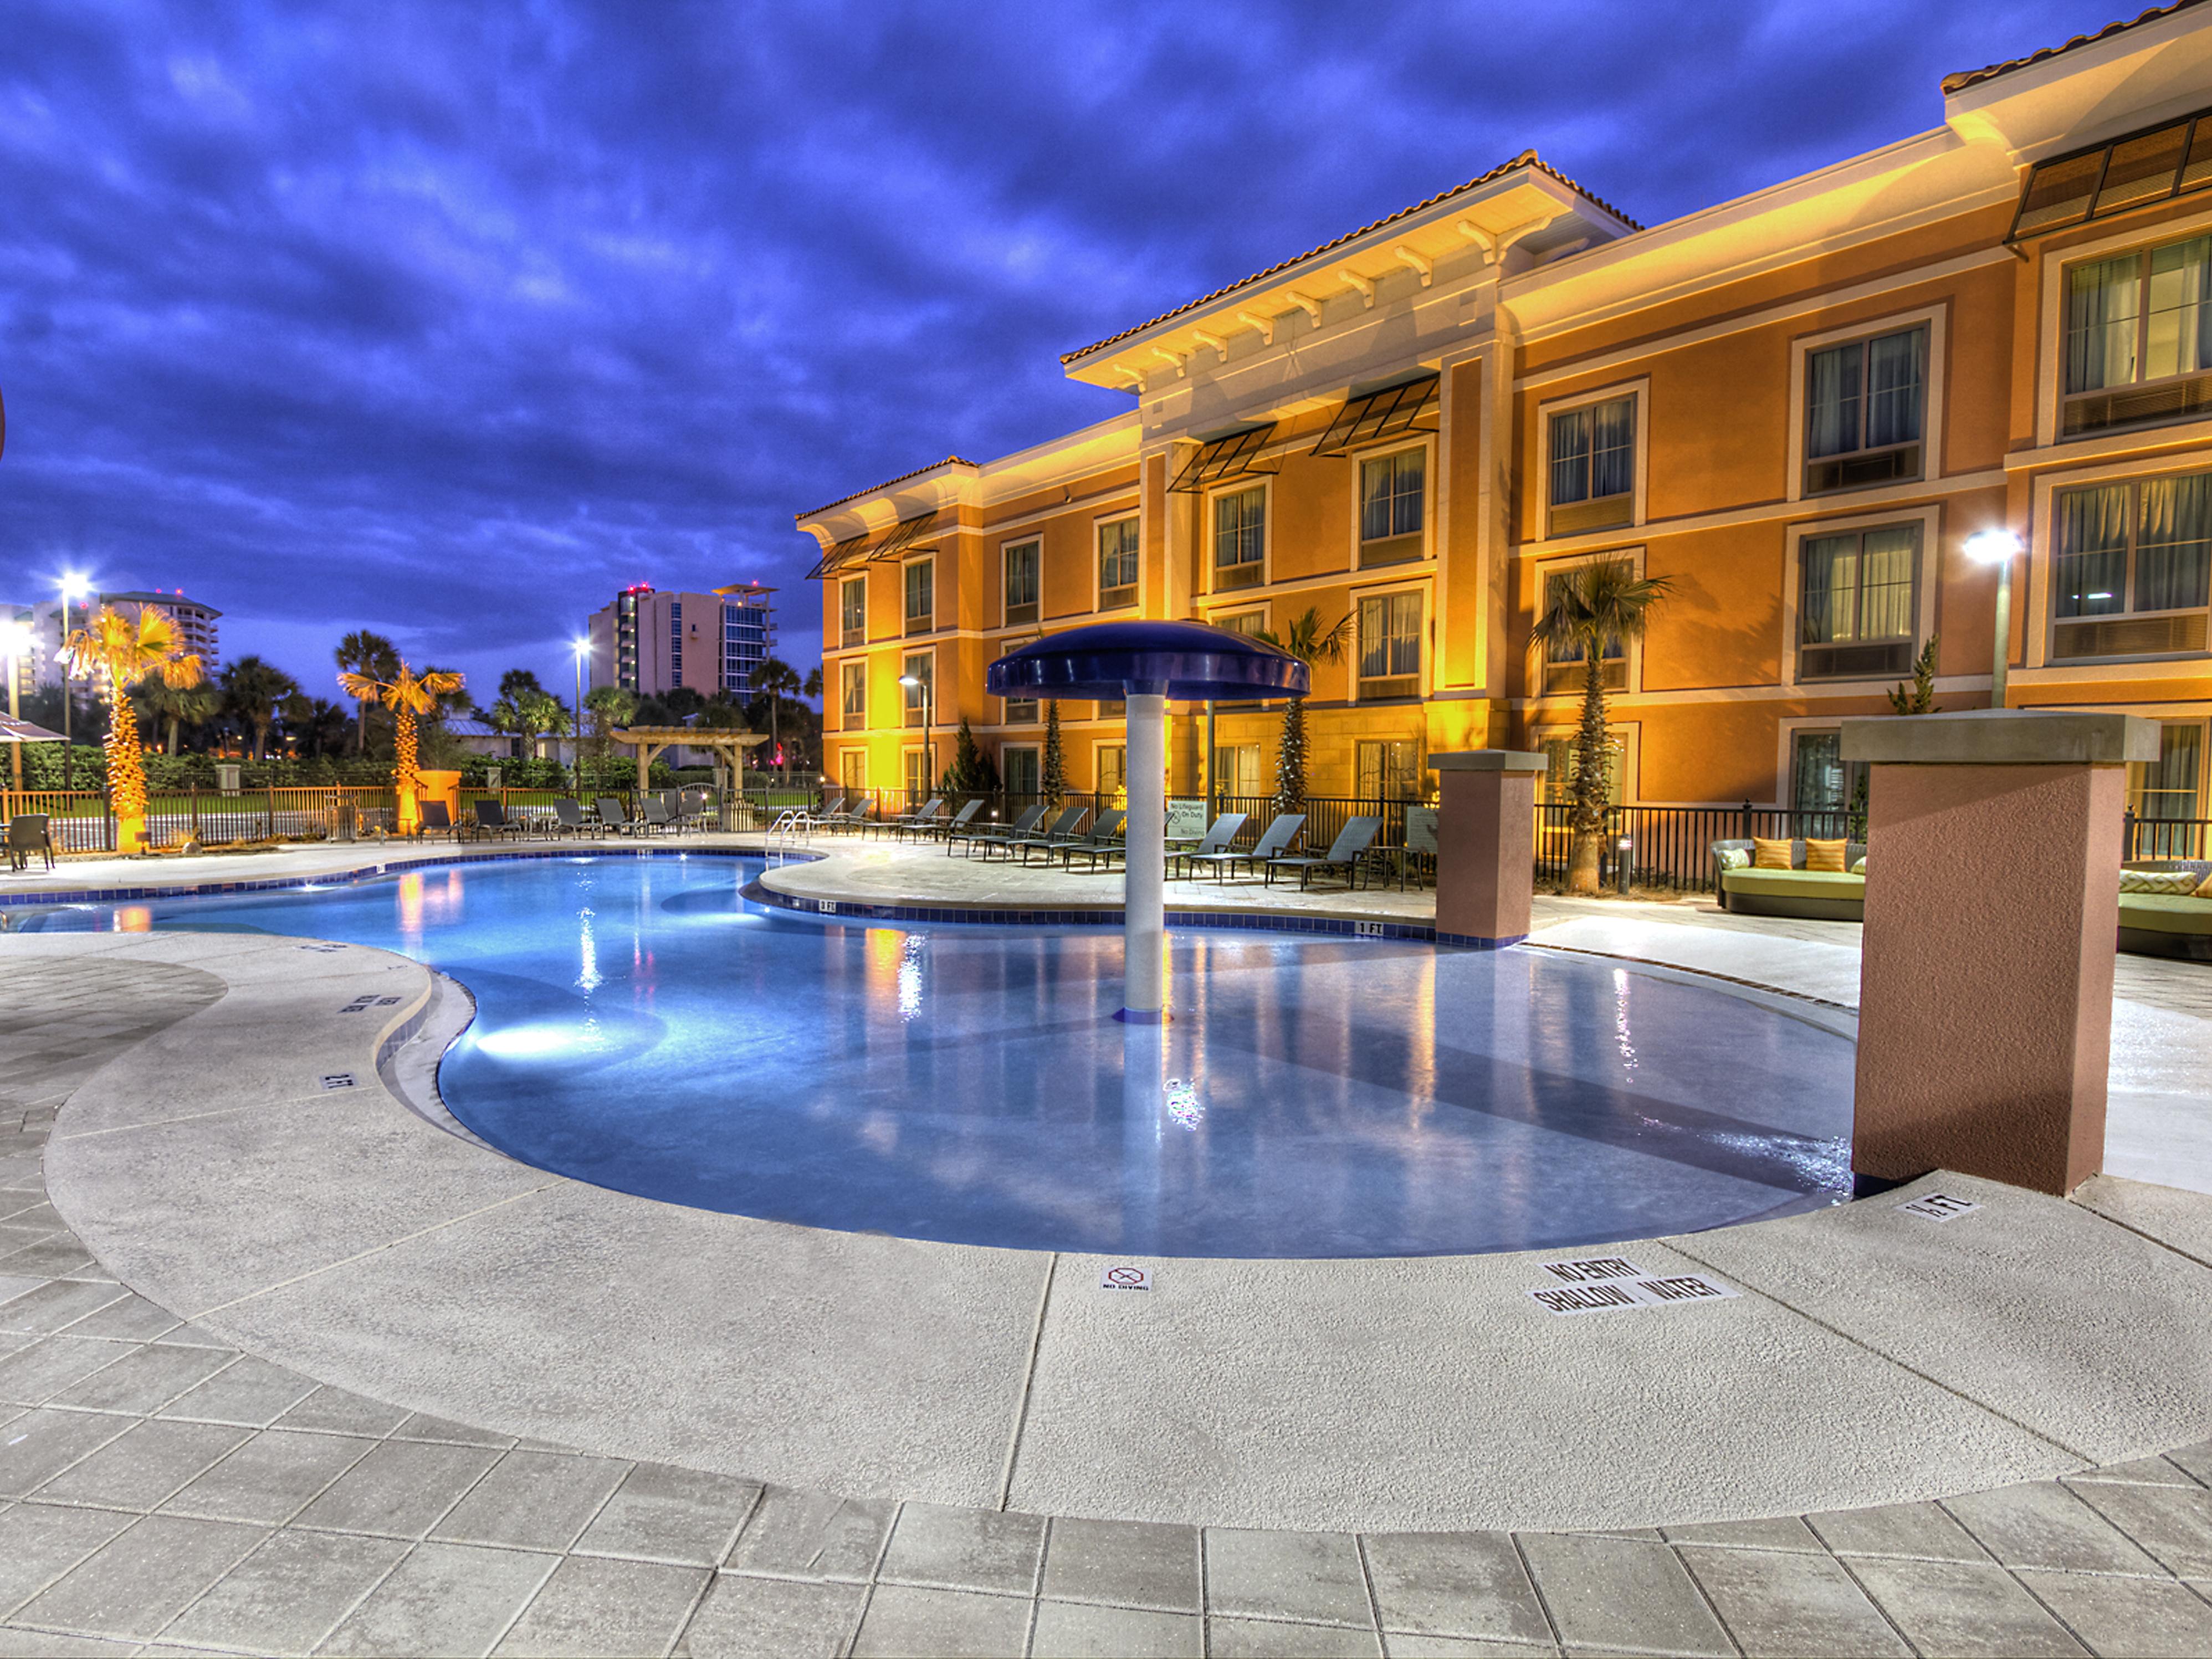 Hampton Inn & Suites Destin Pool